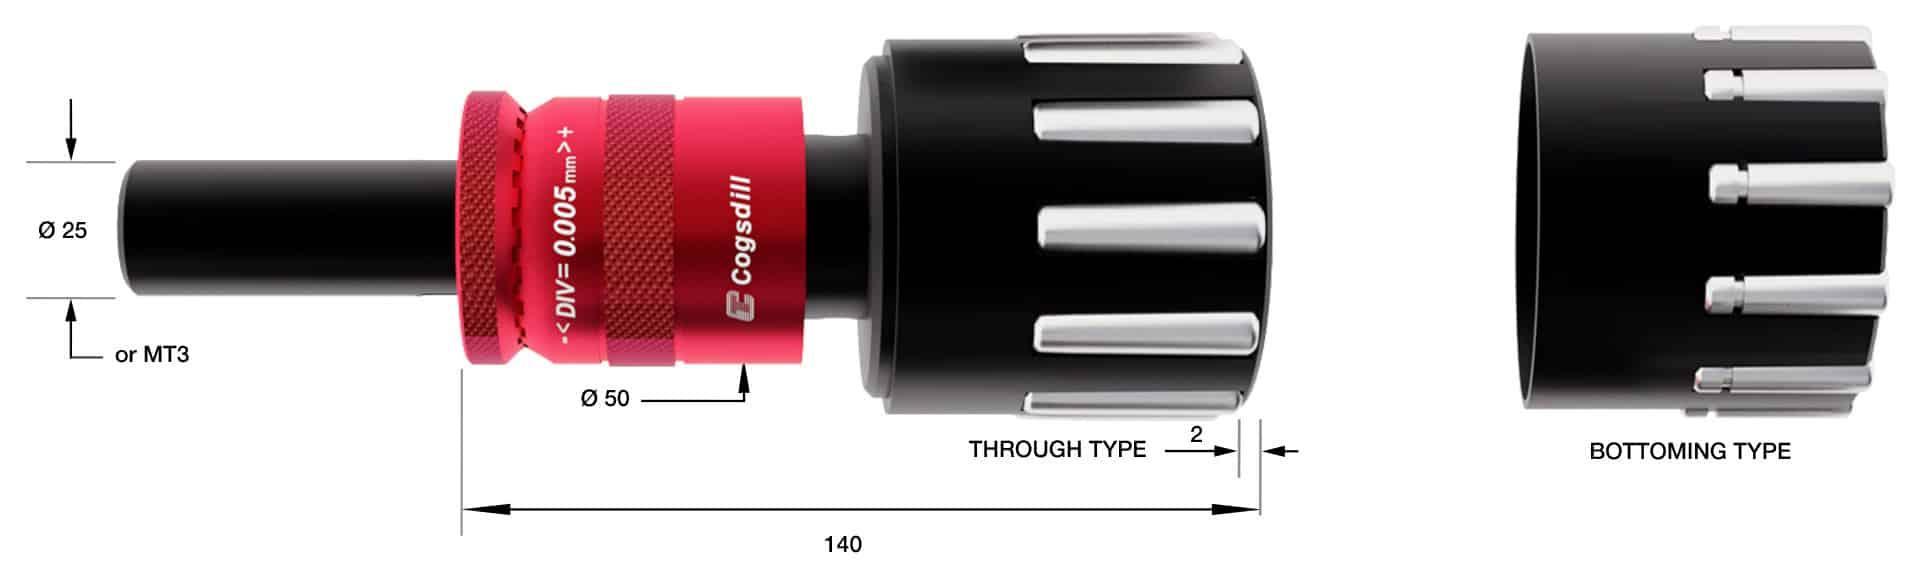 Rollen-Burnishing SRMR72-51-89 Diagramm